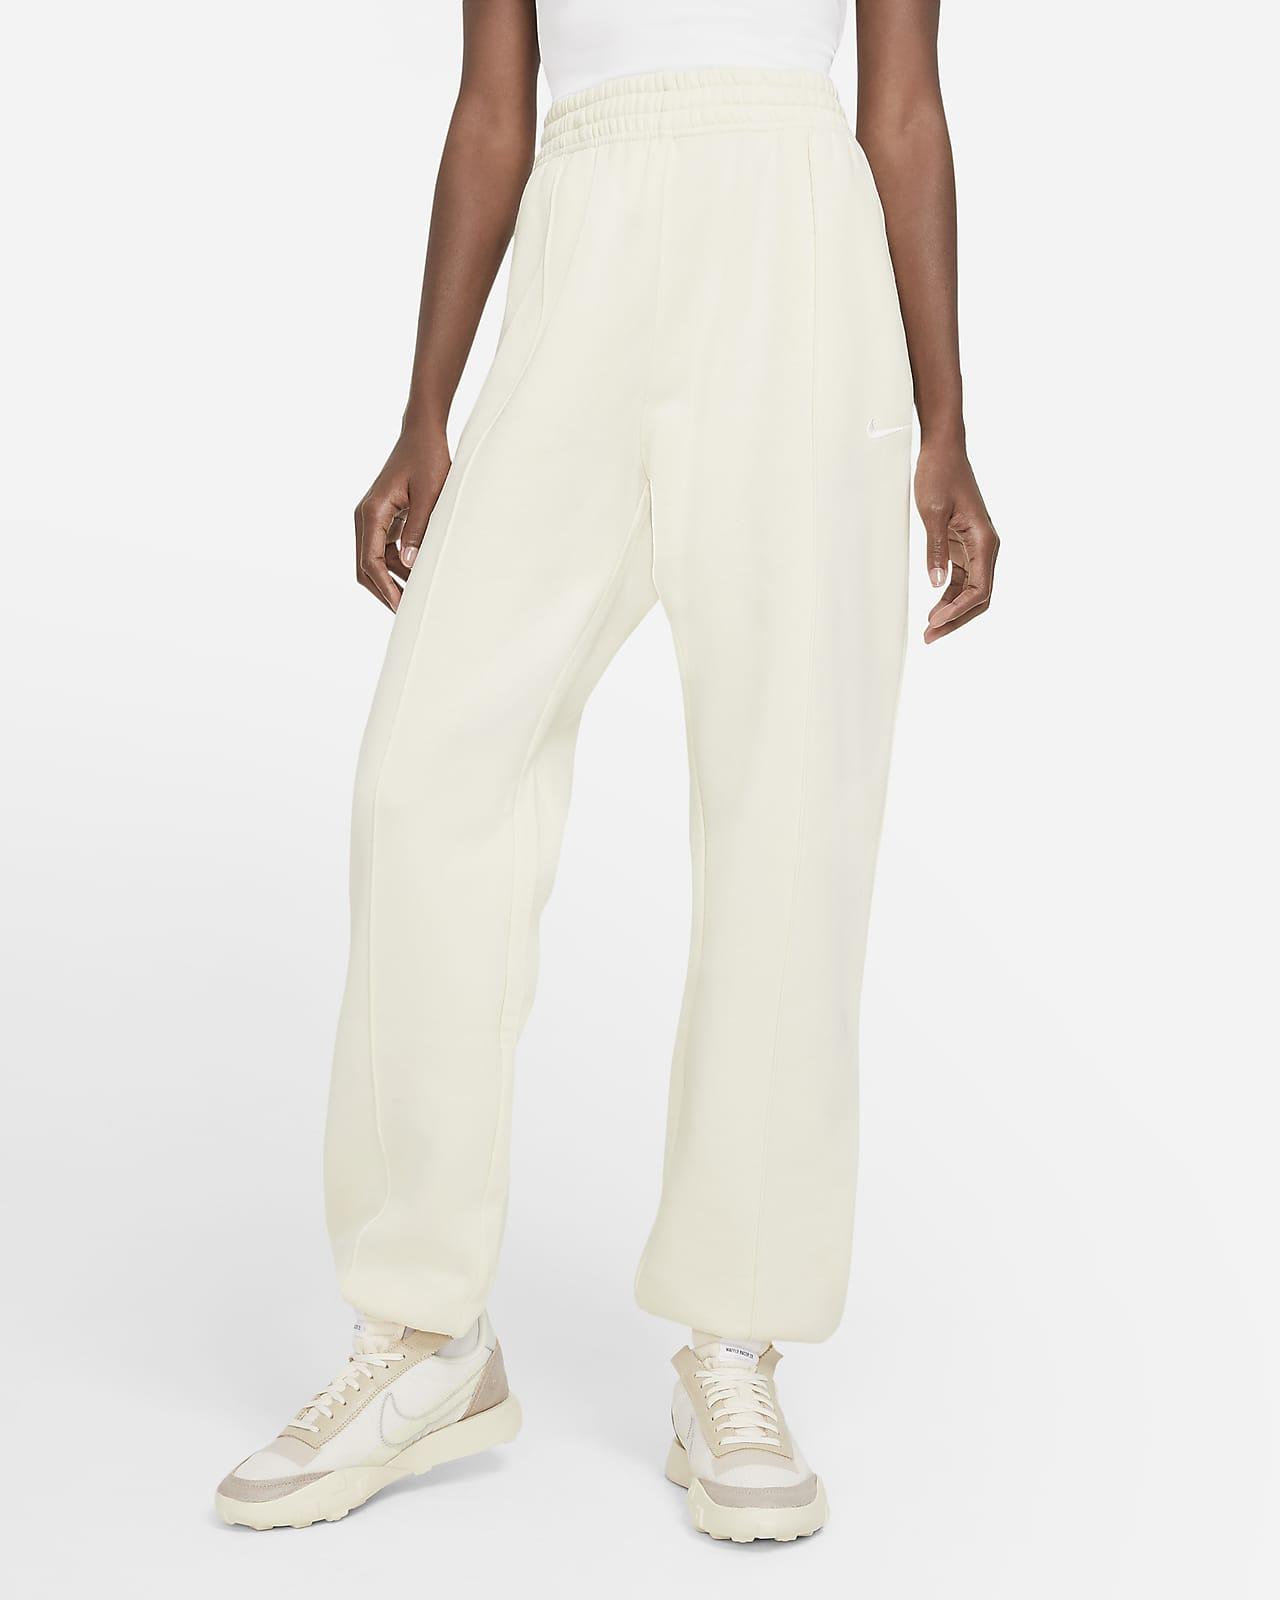 Pantalon en tissu Fleece Nike Sportswear Essential Collection pour Femme